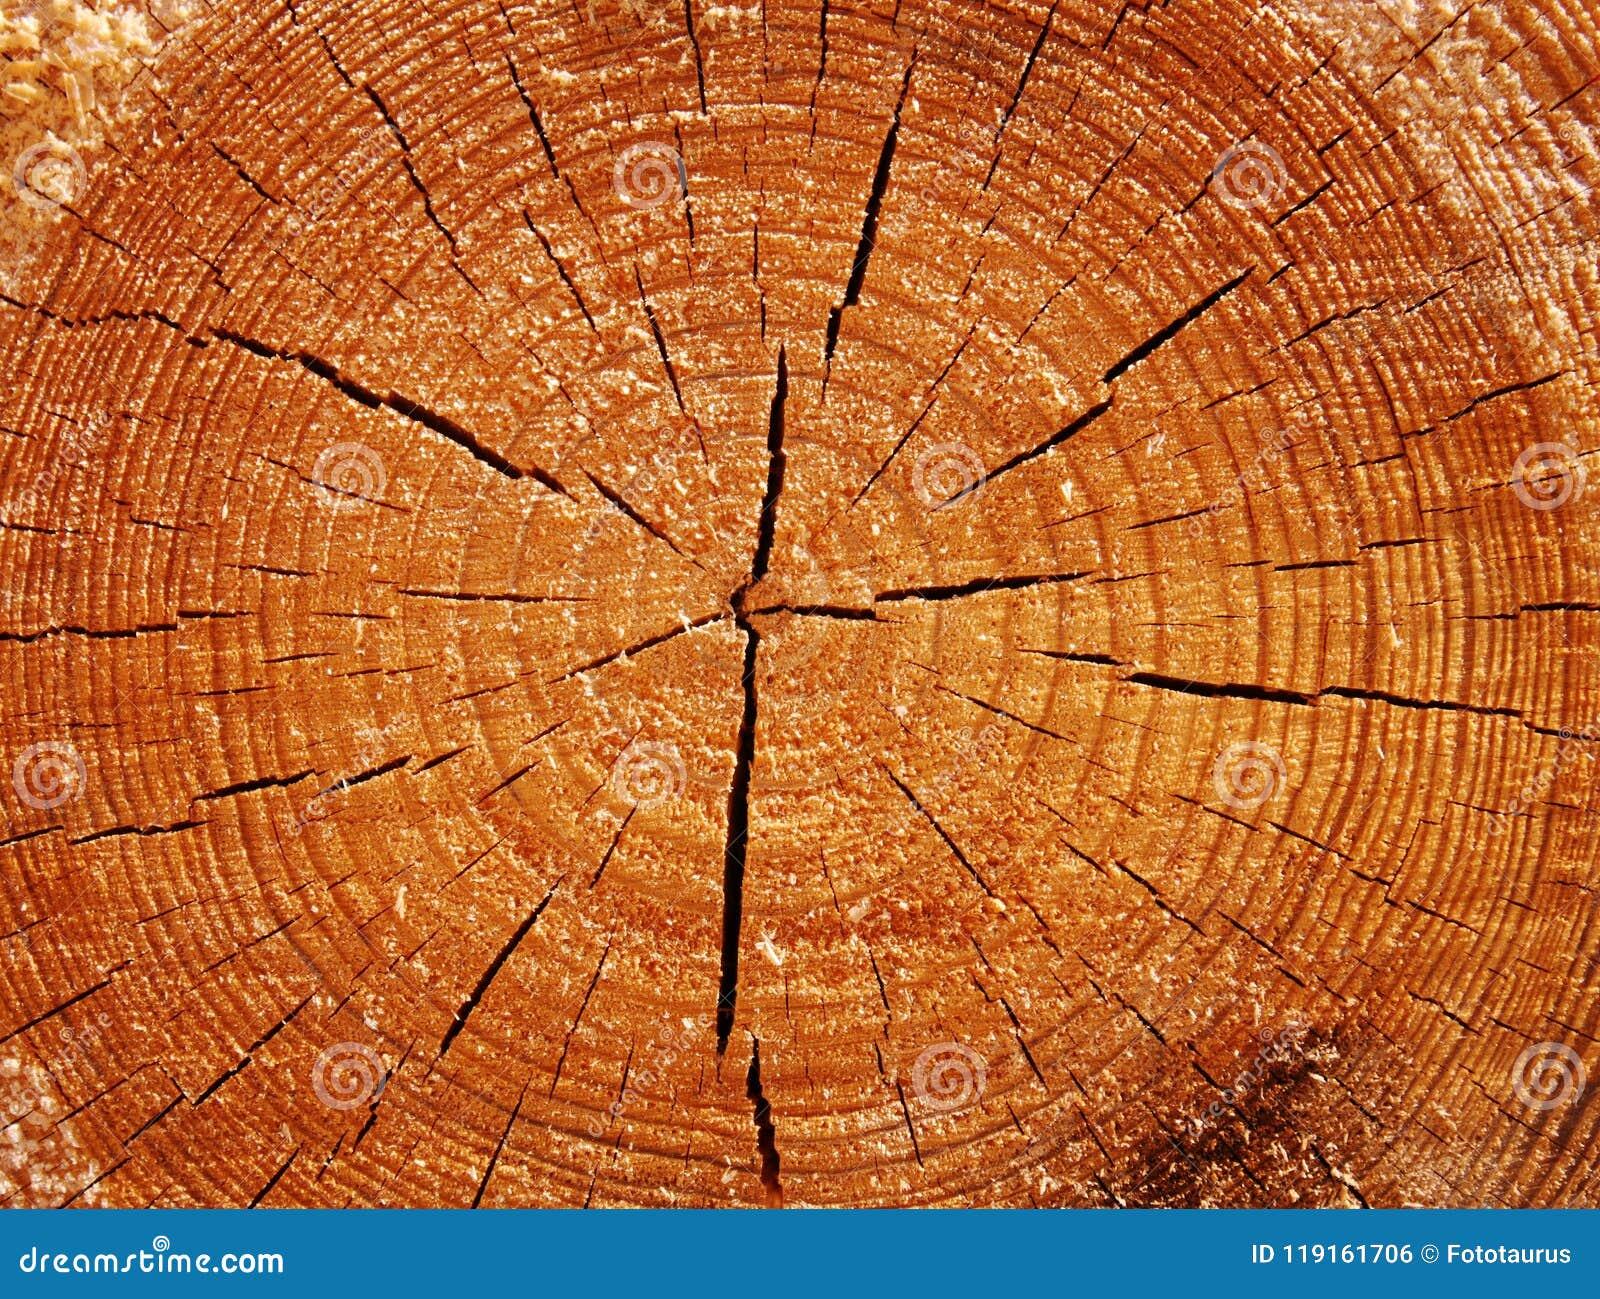 Original wood texture on the cut